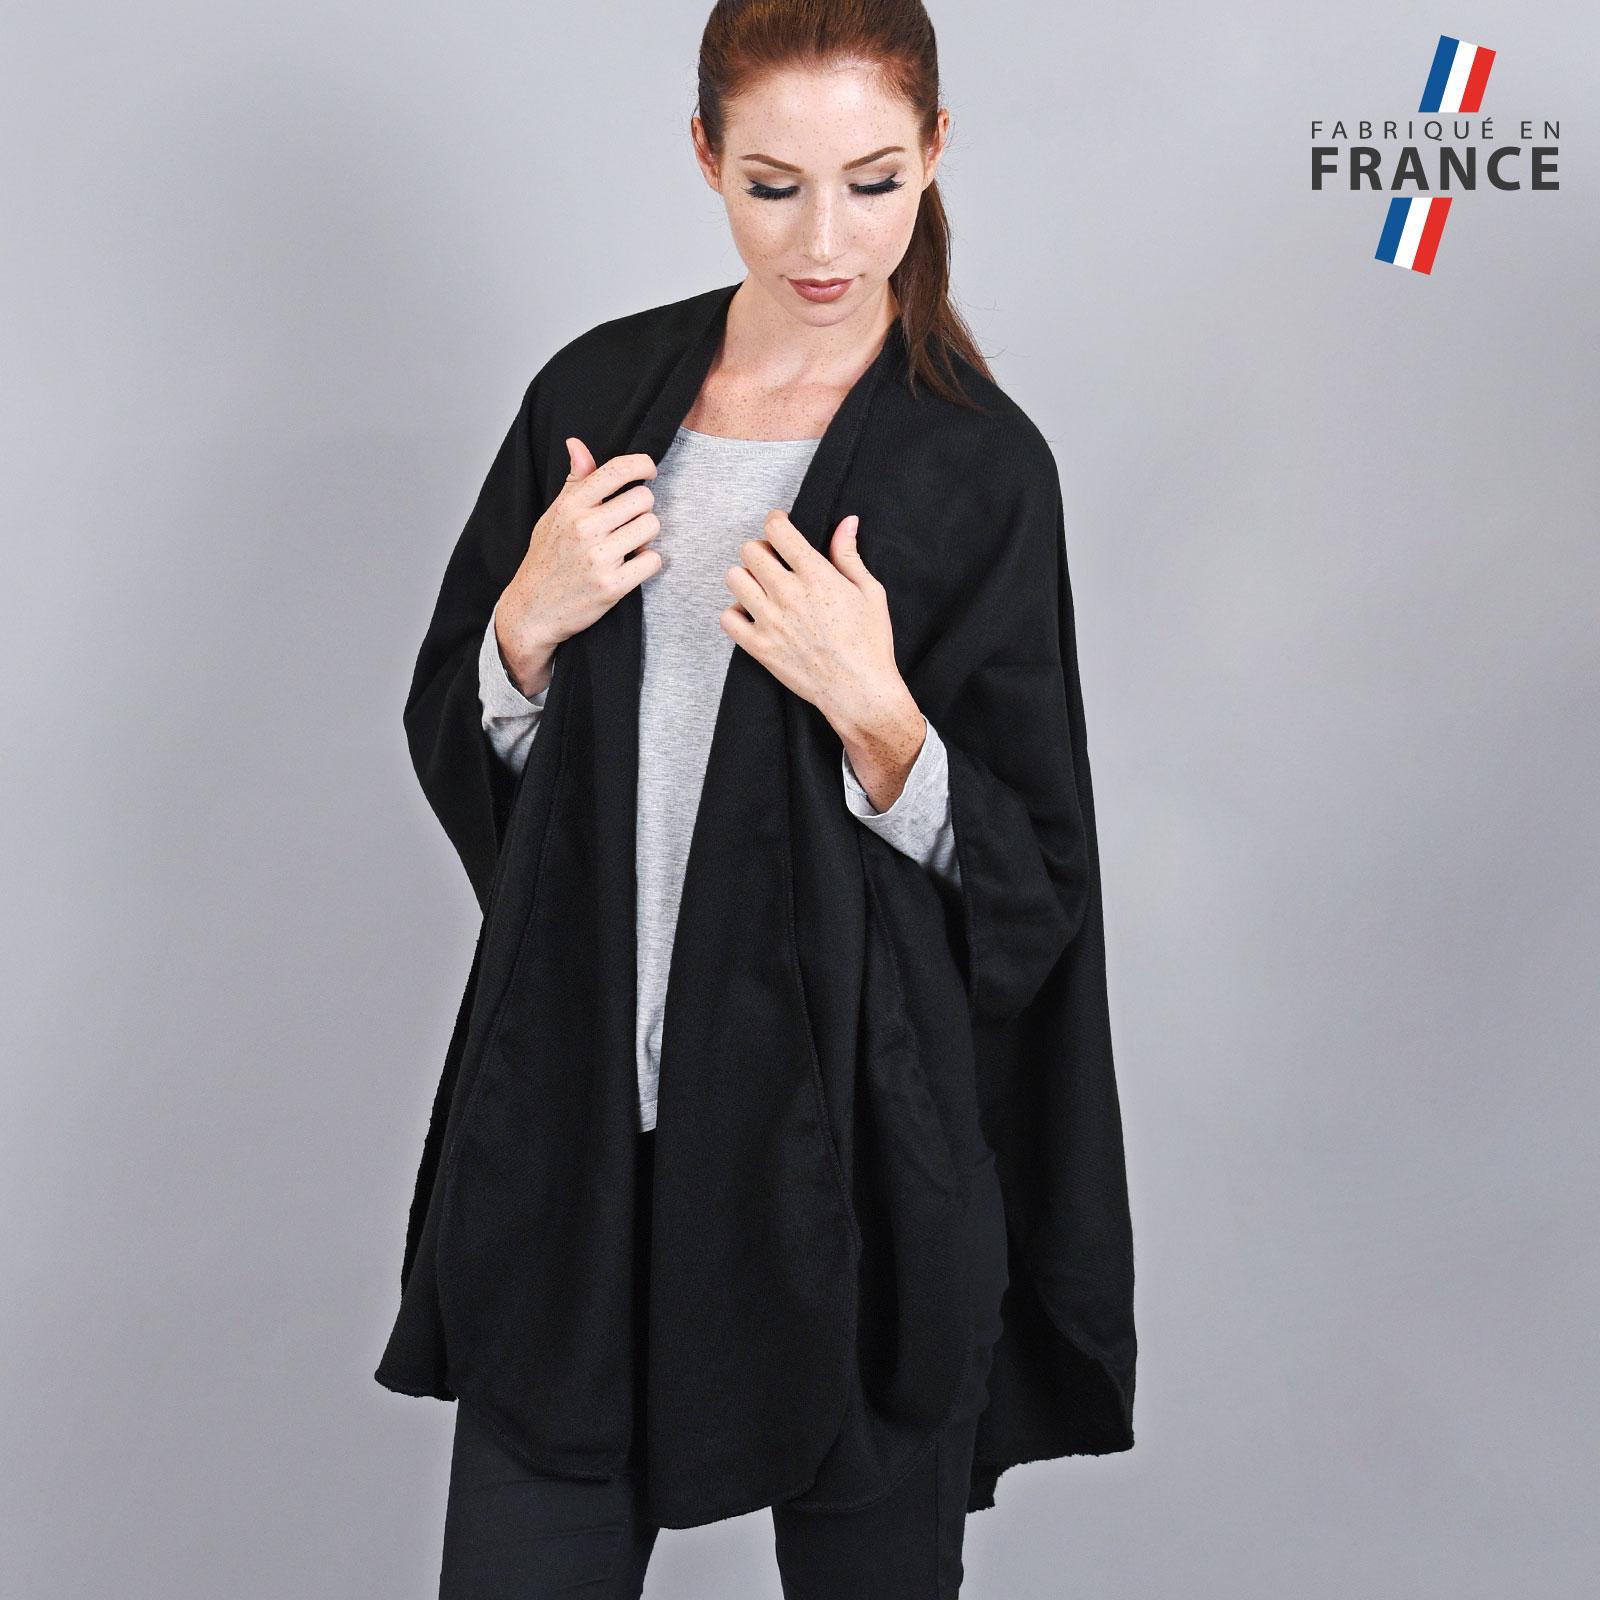 AT-03262-VF16-LB_FR-poncho-rond-fabrique-en-france-noir